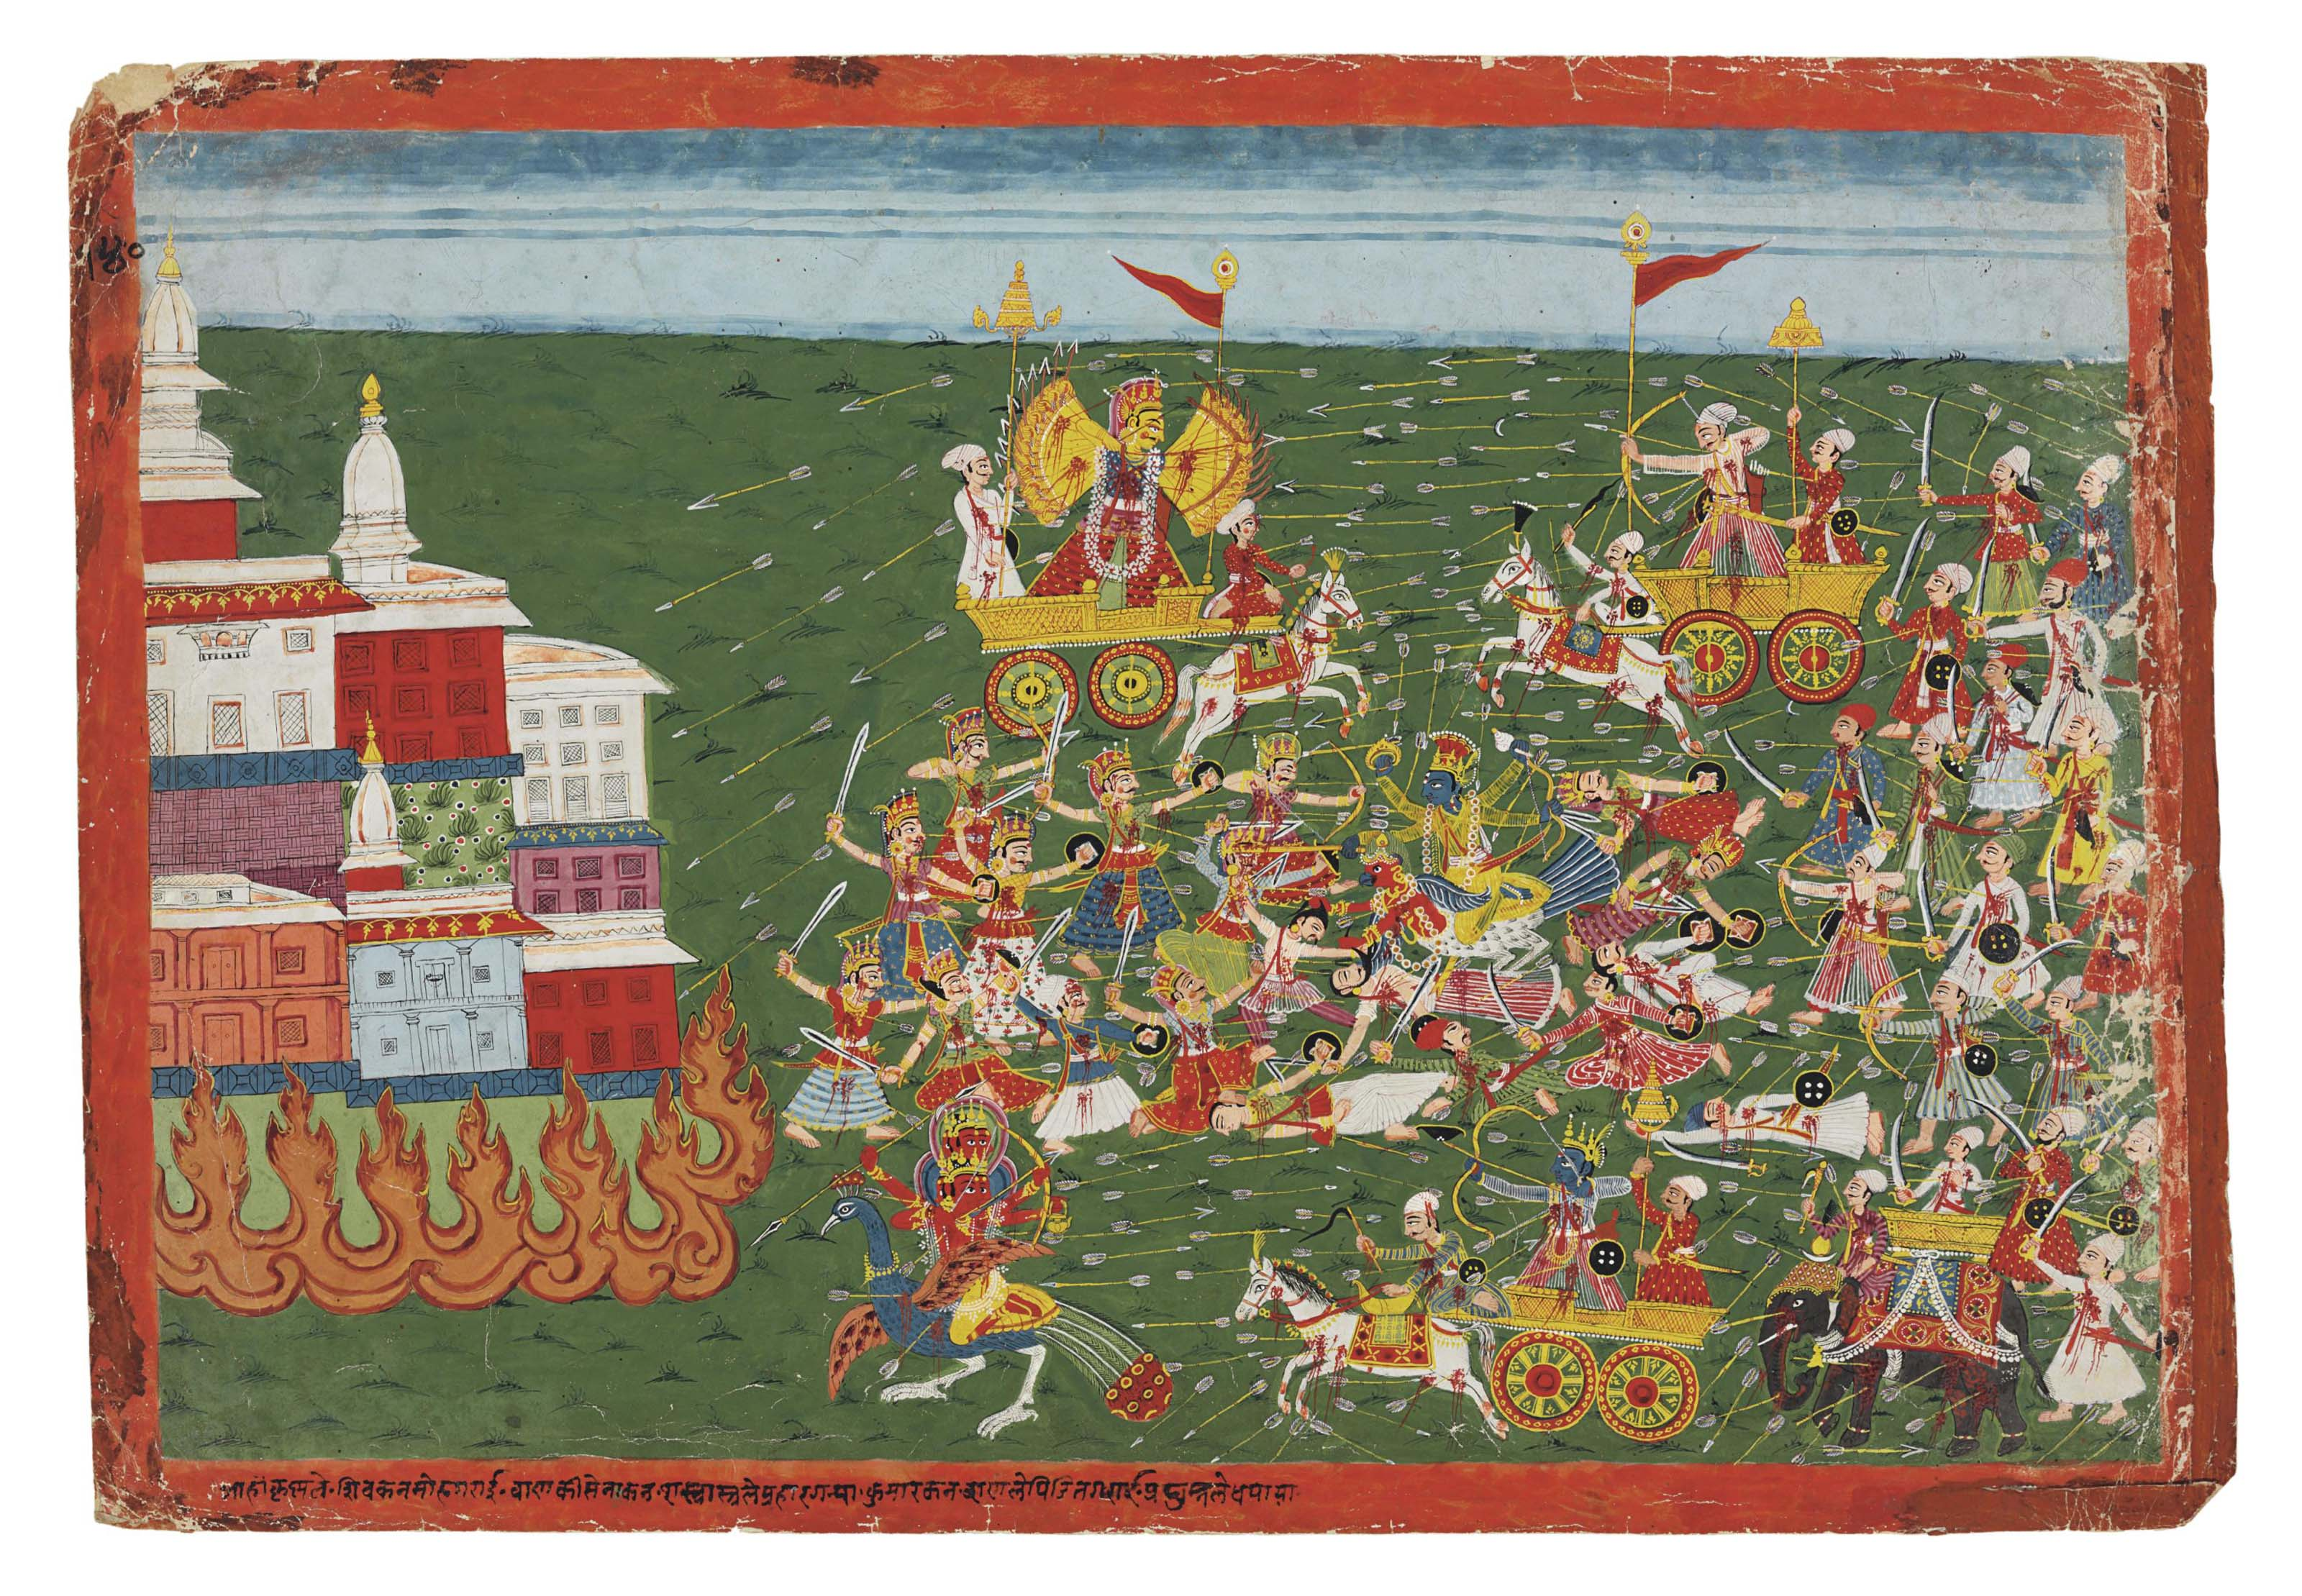 garuda purana essay The garuda purana is one of eighteen mahāpurāṇa genre of texts in hinduism it  is a part of  way of life: king, householder, renouncer : essays in honour of  louis dumont motilal banarsidass isbn 978-81-208-0527-9 rocher, ludo.